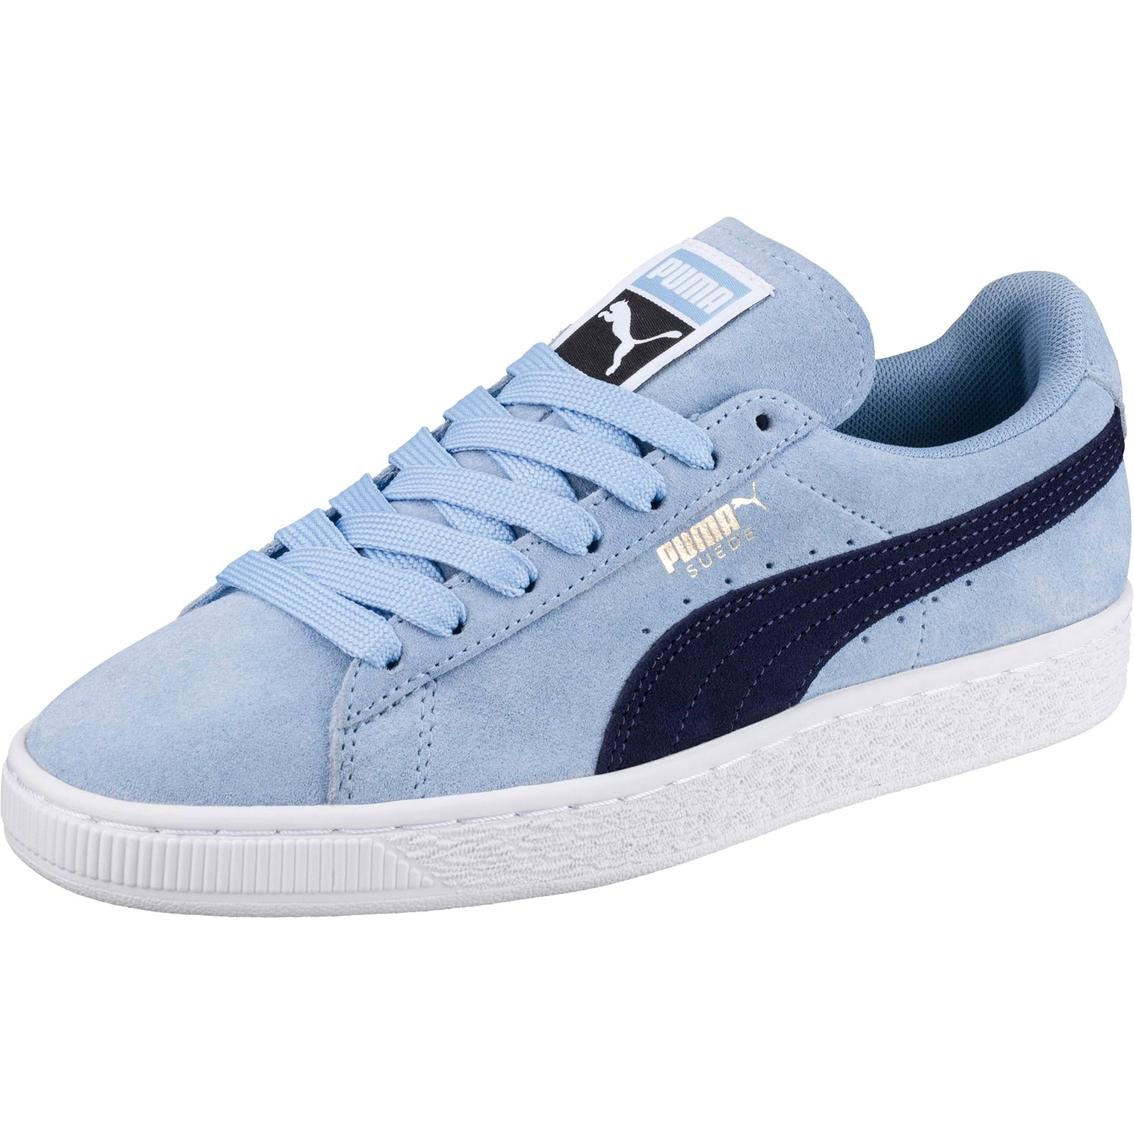 Puma Suede Classics Women s Sneakers  763f9b2b94